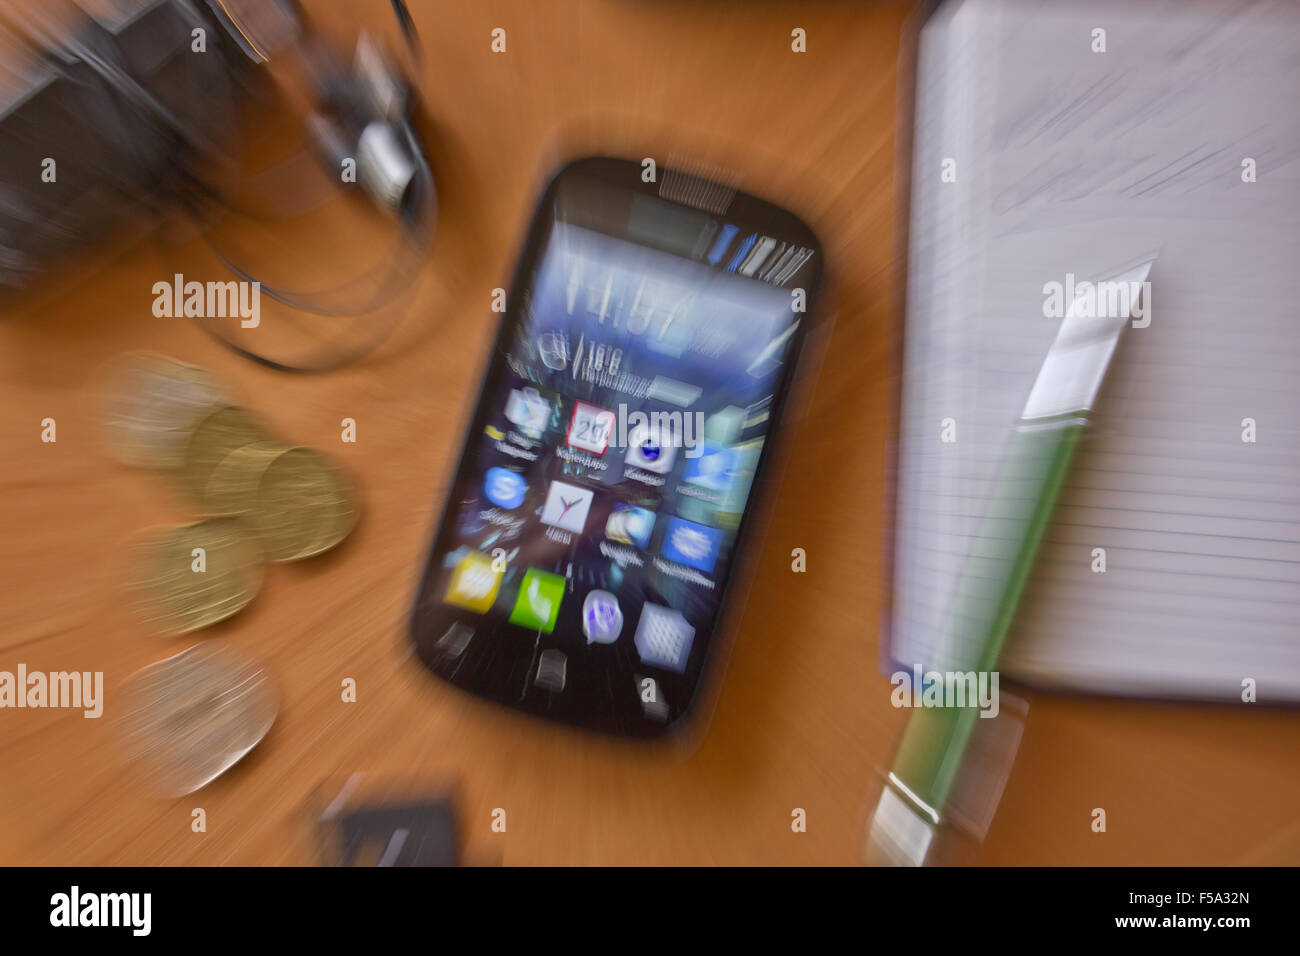 Motion blur around a smartphone - Stock Image